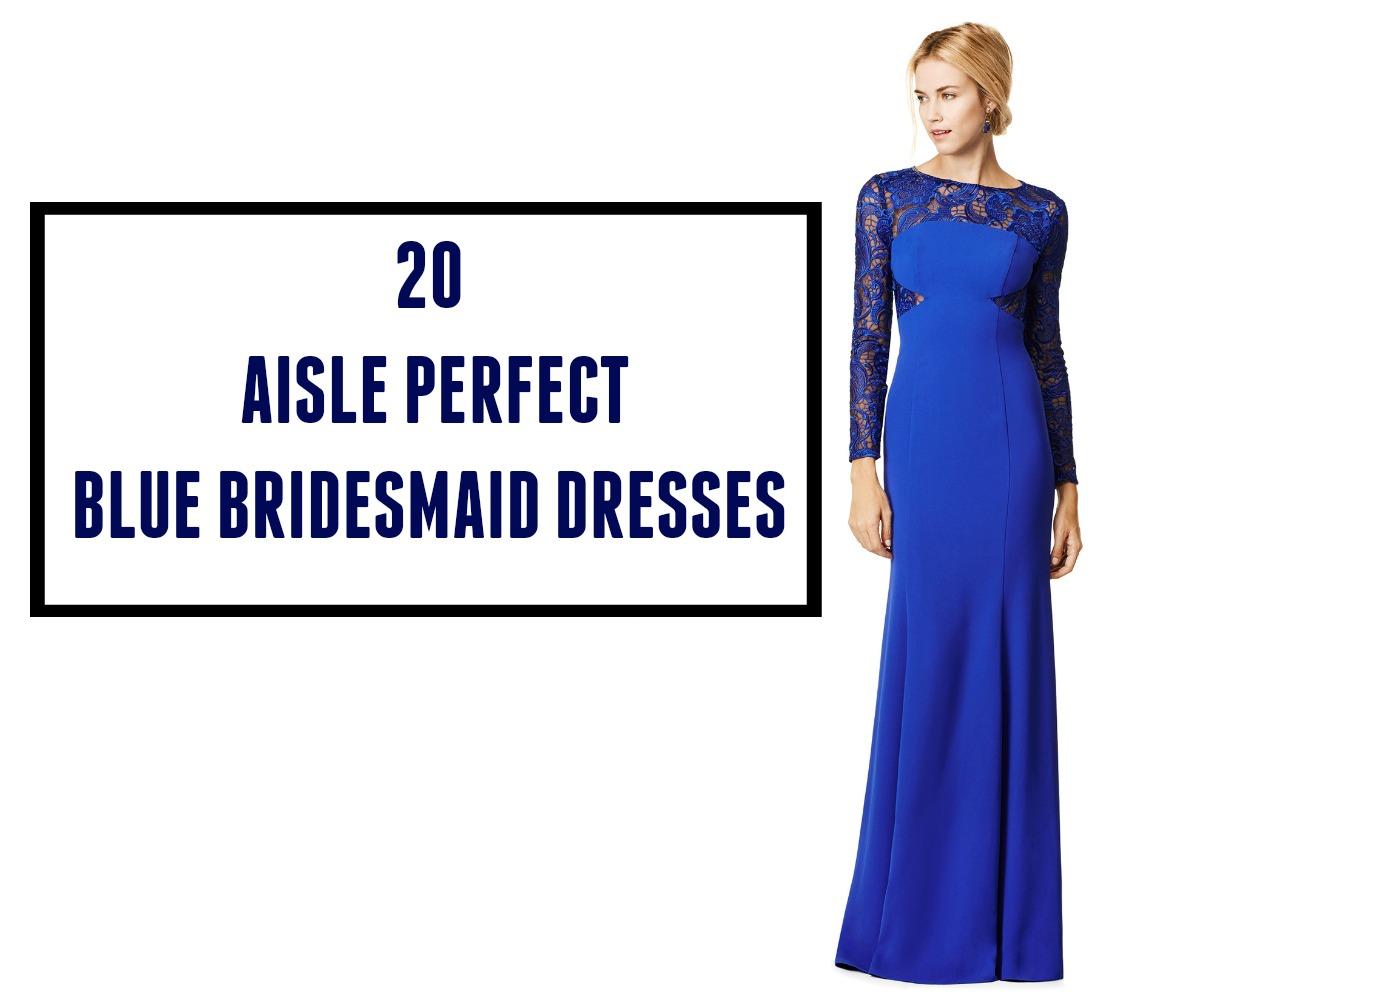 20 aisle perfect blue bridesmaid dresses